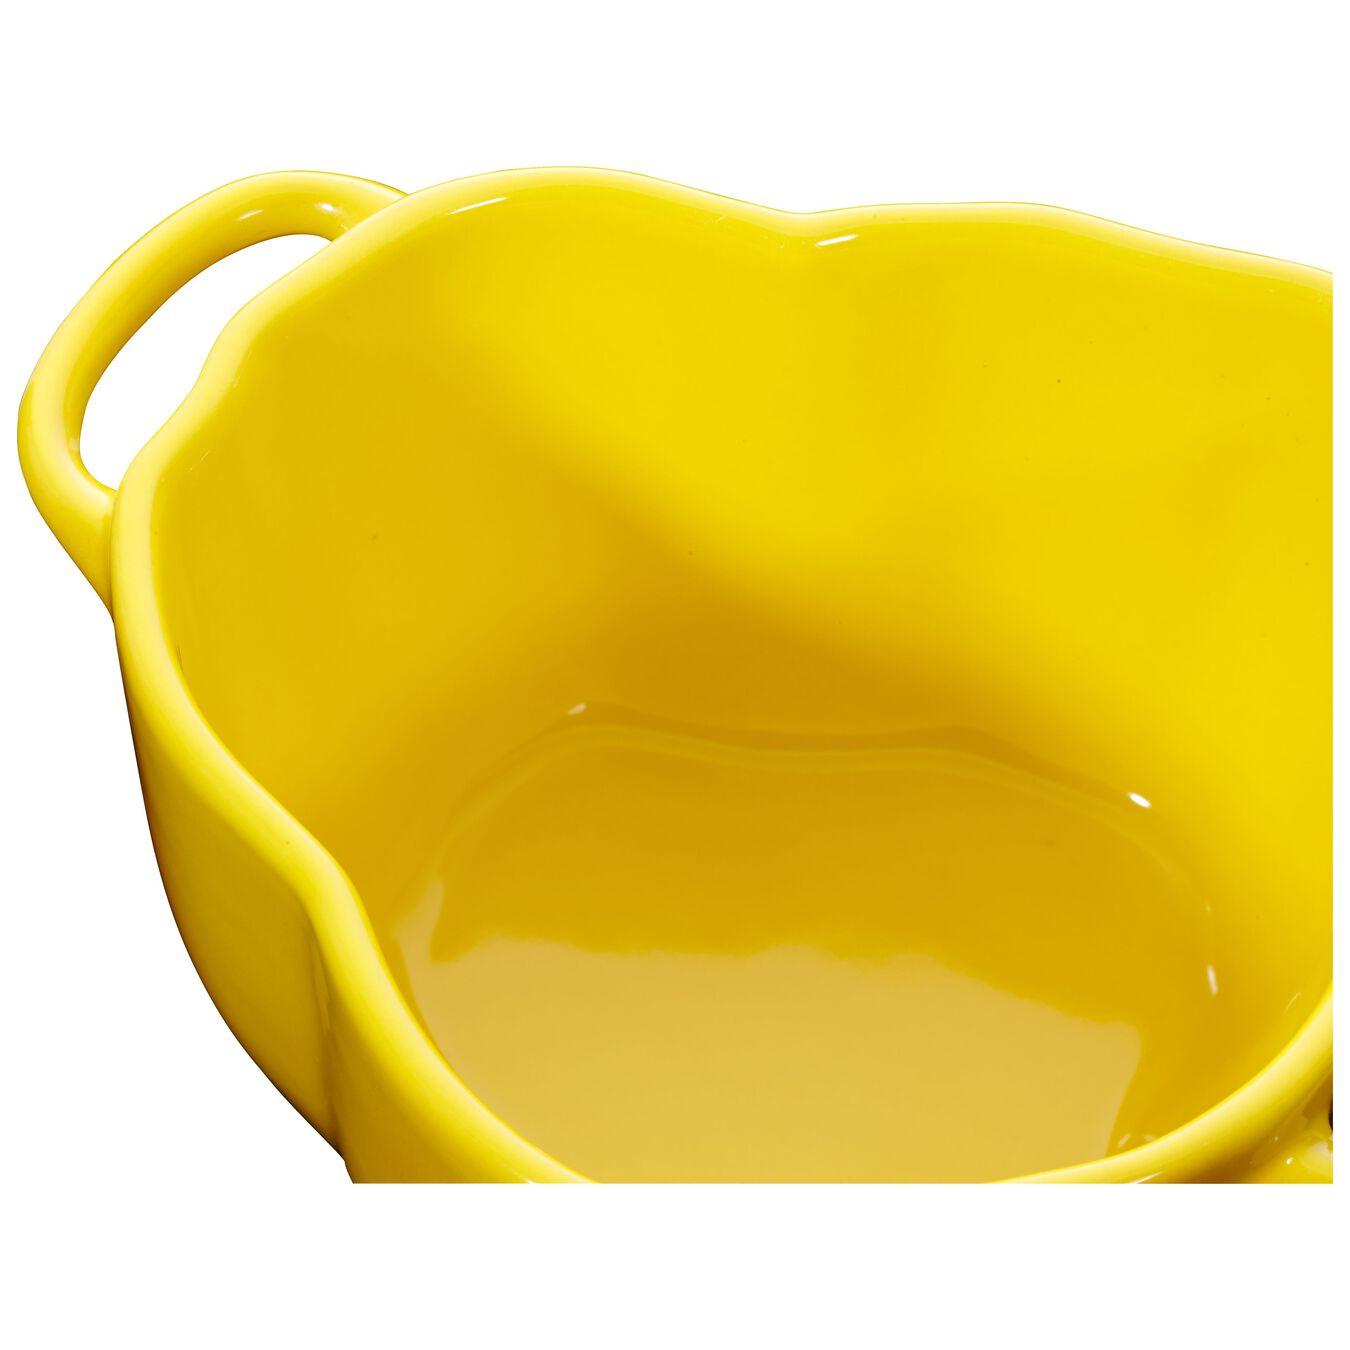 Cocotte 12 cm, Paprika, Gelb, Keramik,,large 2